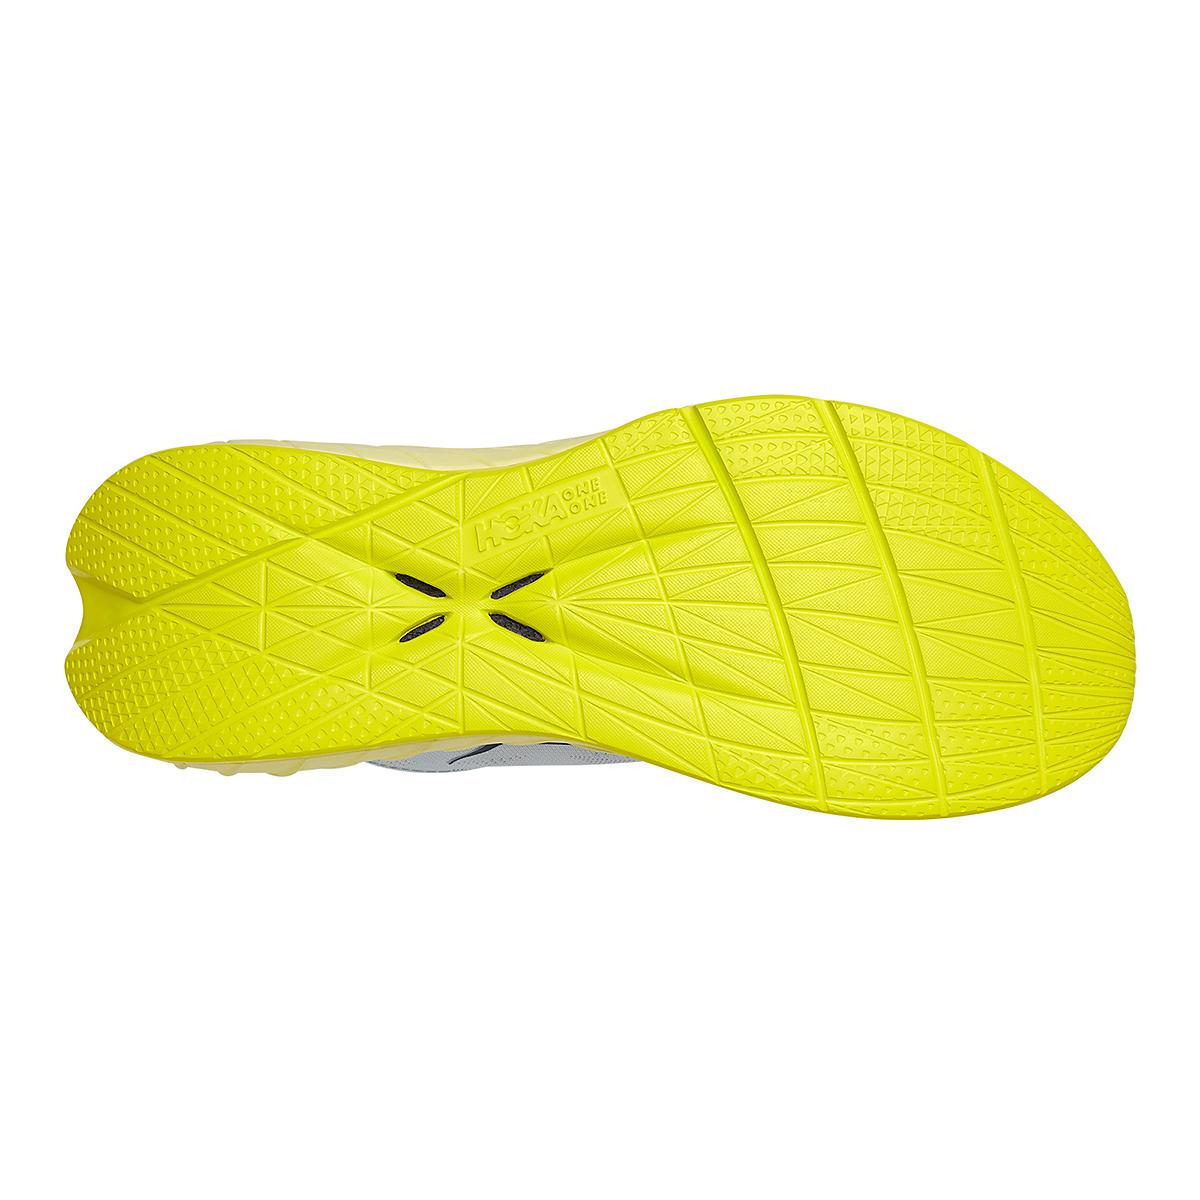 Women's Hoka One One Carbon X 2 Running Shoe - Color: Blue Flower/Luminary Green - Size: 5 - Width: Regular, Blue Flower/Luminary Green, large, image 6